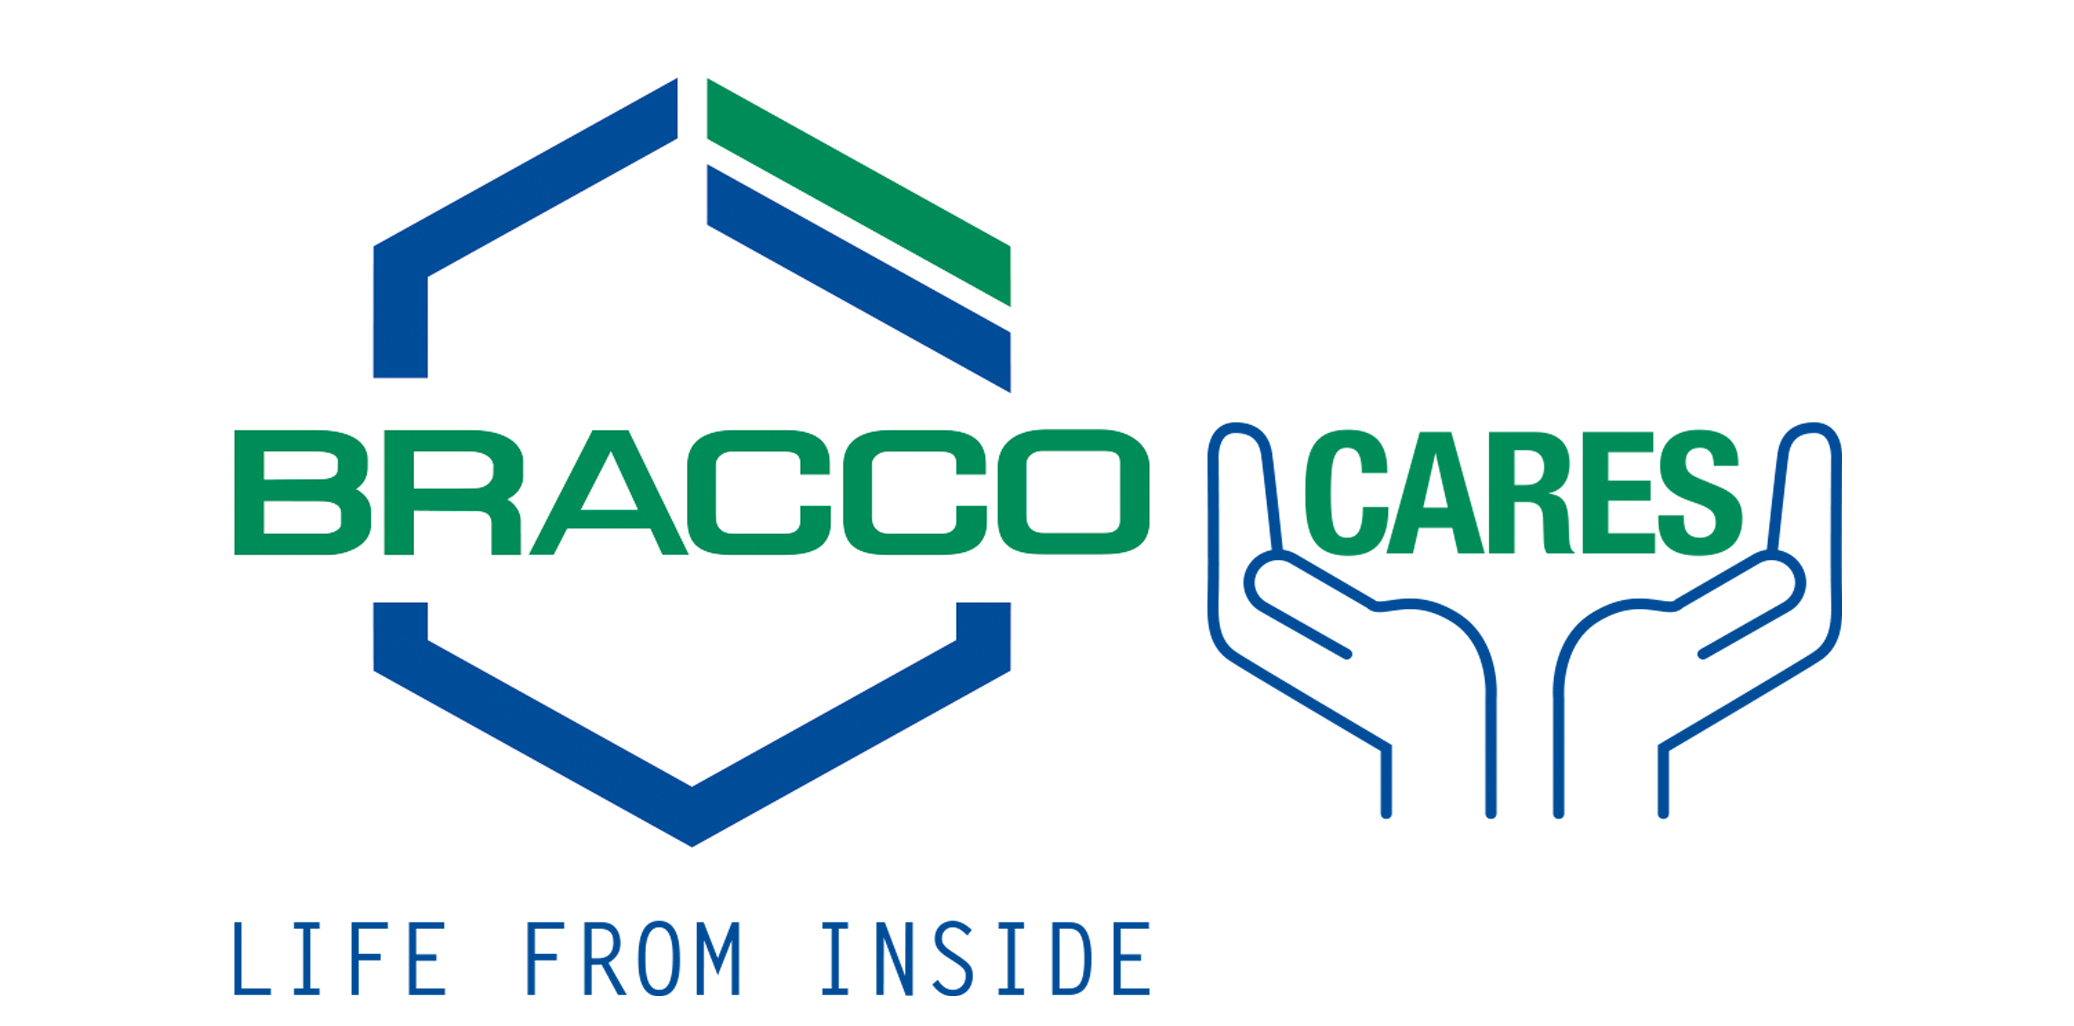 Bracco_Imaging_Bracco_Cares_Logo